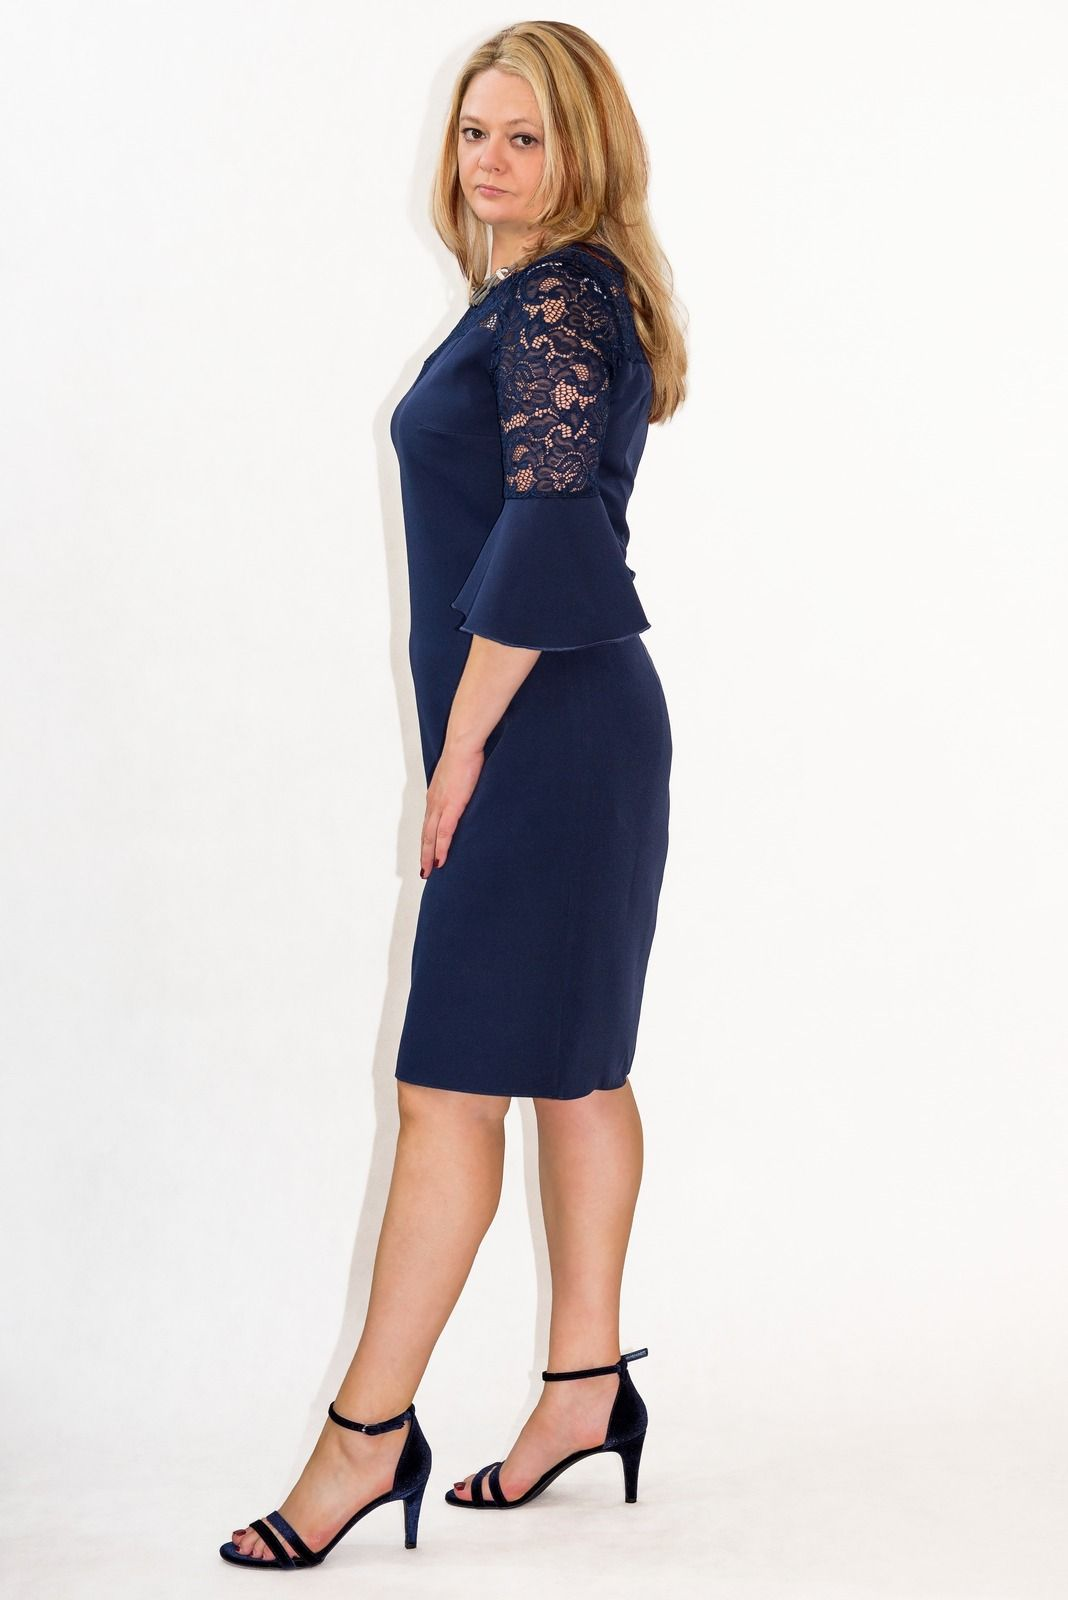 b1f5c739e9 Elegancka sukienka XXL 40-60 na wesele PAOLA duże rozmiary - XELKA ...